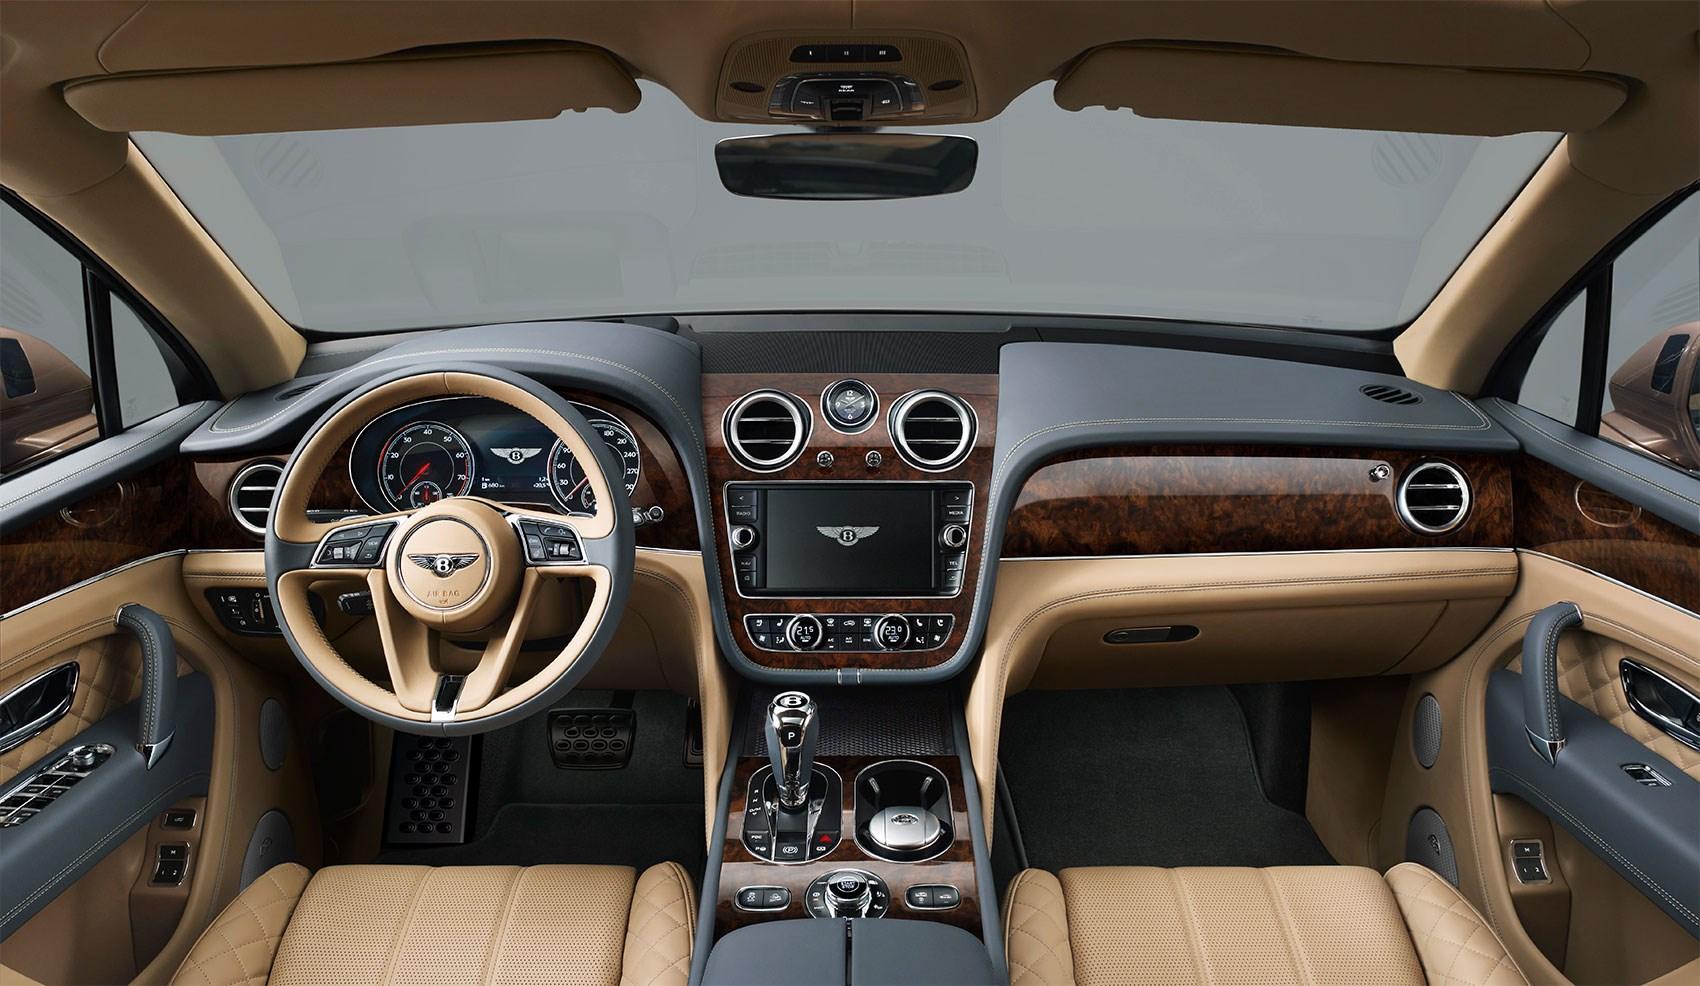 Bentley Bentayga W12 (2016) review | CAR Magazine on bentley truck, bentley watch, bentley arnage, bentley sport, bentley cars 2013, bentley zagato, bentley state limousine, bentley car models, bentley icon, bentley wagon, bentley coop, bentley 2013 models, bentley hearse, bentley brooklands, bentley racing cars, bentley symbol, bentley automobiles, bentley concept, bentley falcon, bentley maybach,